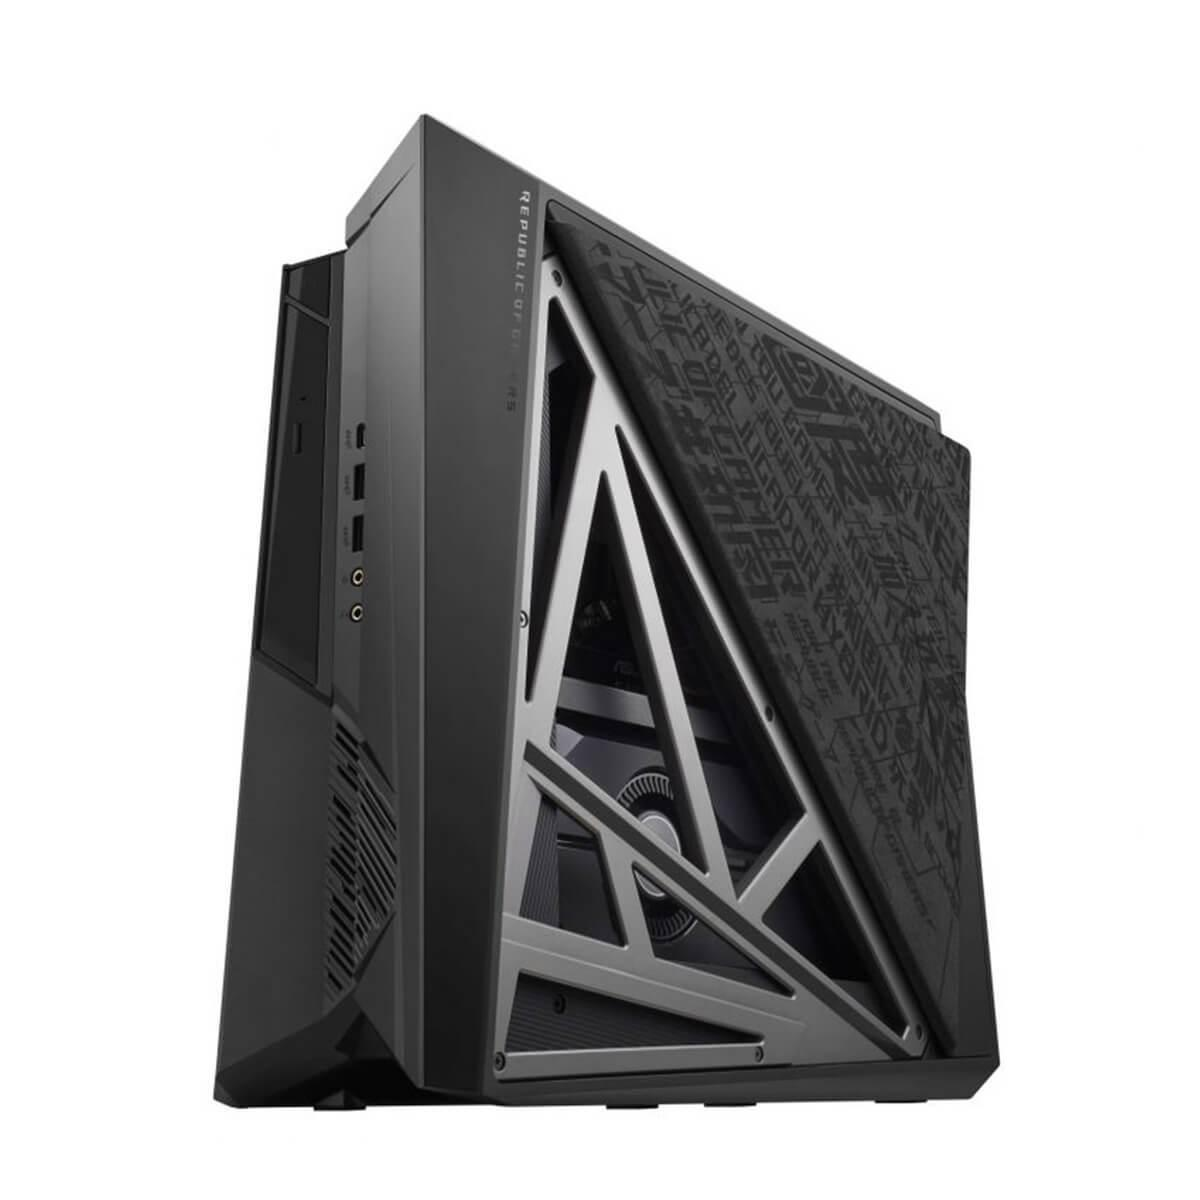 ASUS ROG Huracan G21CN-SG007T (I7-8700/16GB/2TB HDD+256GB SSD/GTX1070)